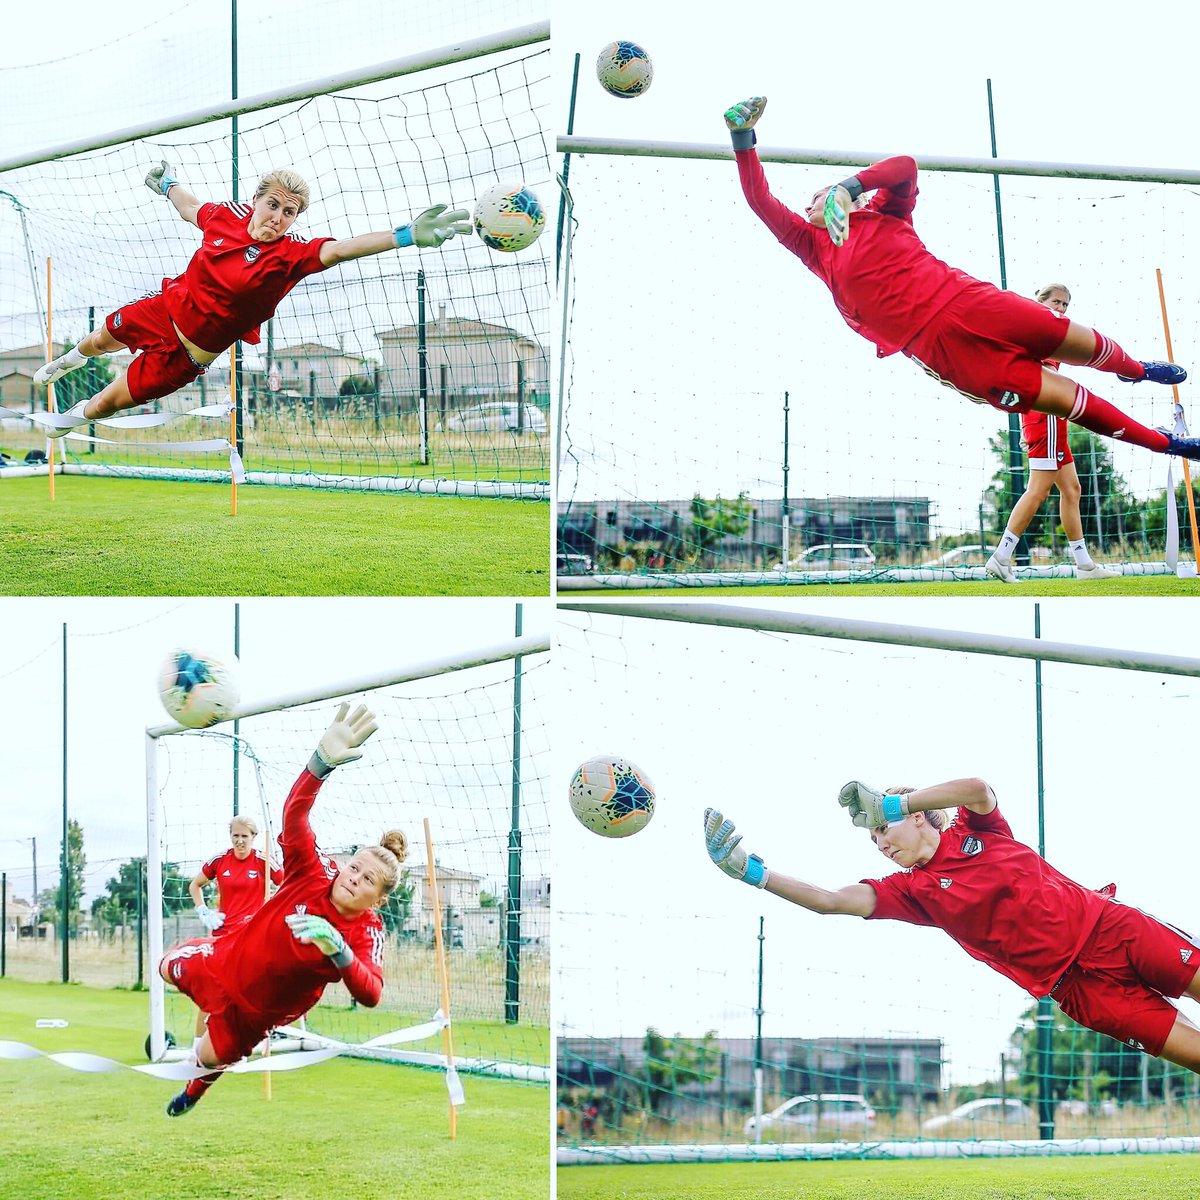 I believe I can fly!! @fcgbwomen 🔵⚪️ @neuq 📸 #football #foot #soccer #footfeminin #footballfeminin #gardiendebut #goalkeeper #goalkeepercoach #coach #footballcoach #fcgb #fcgbwomen #adidasfootball #Bordeauxmaville #saison2021 #diving #plongeons #ibelieveicanfly https://t.co/kJOq0Iypgu